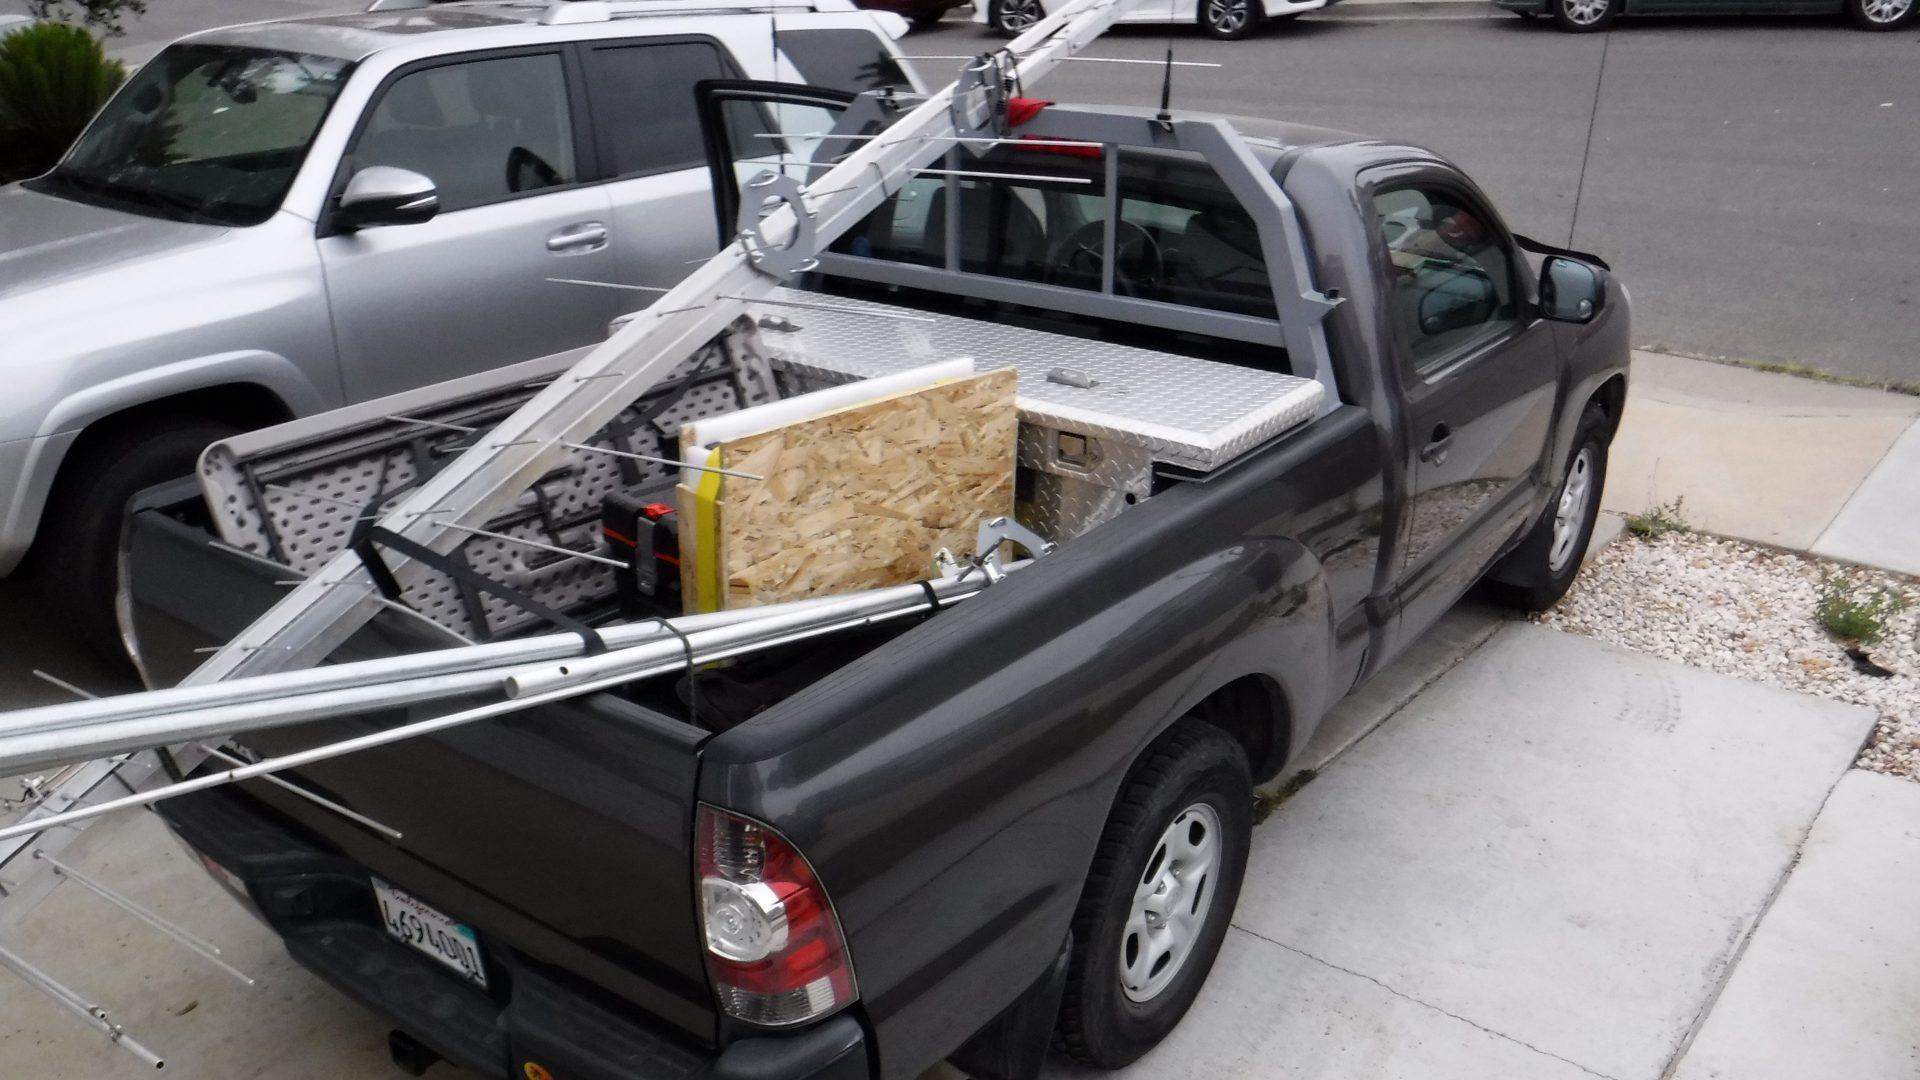 Pickup truck with ham radio gear for contestin